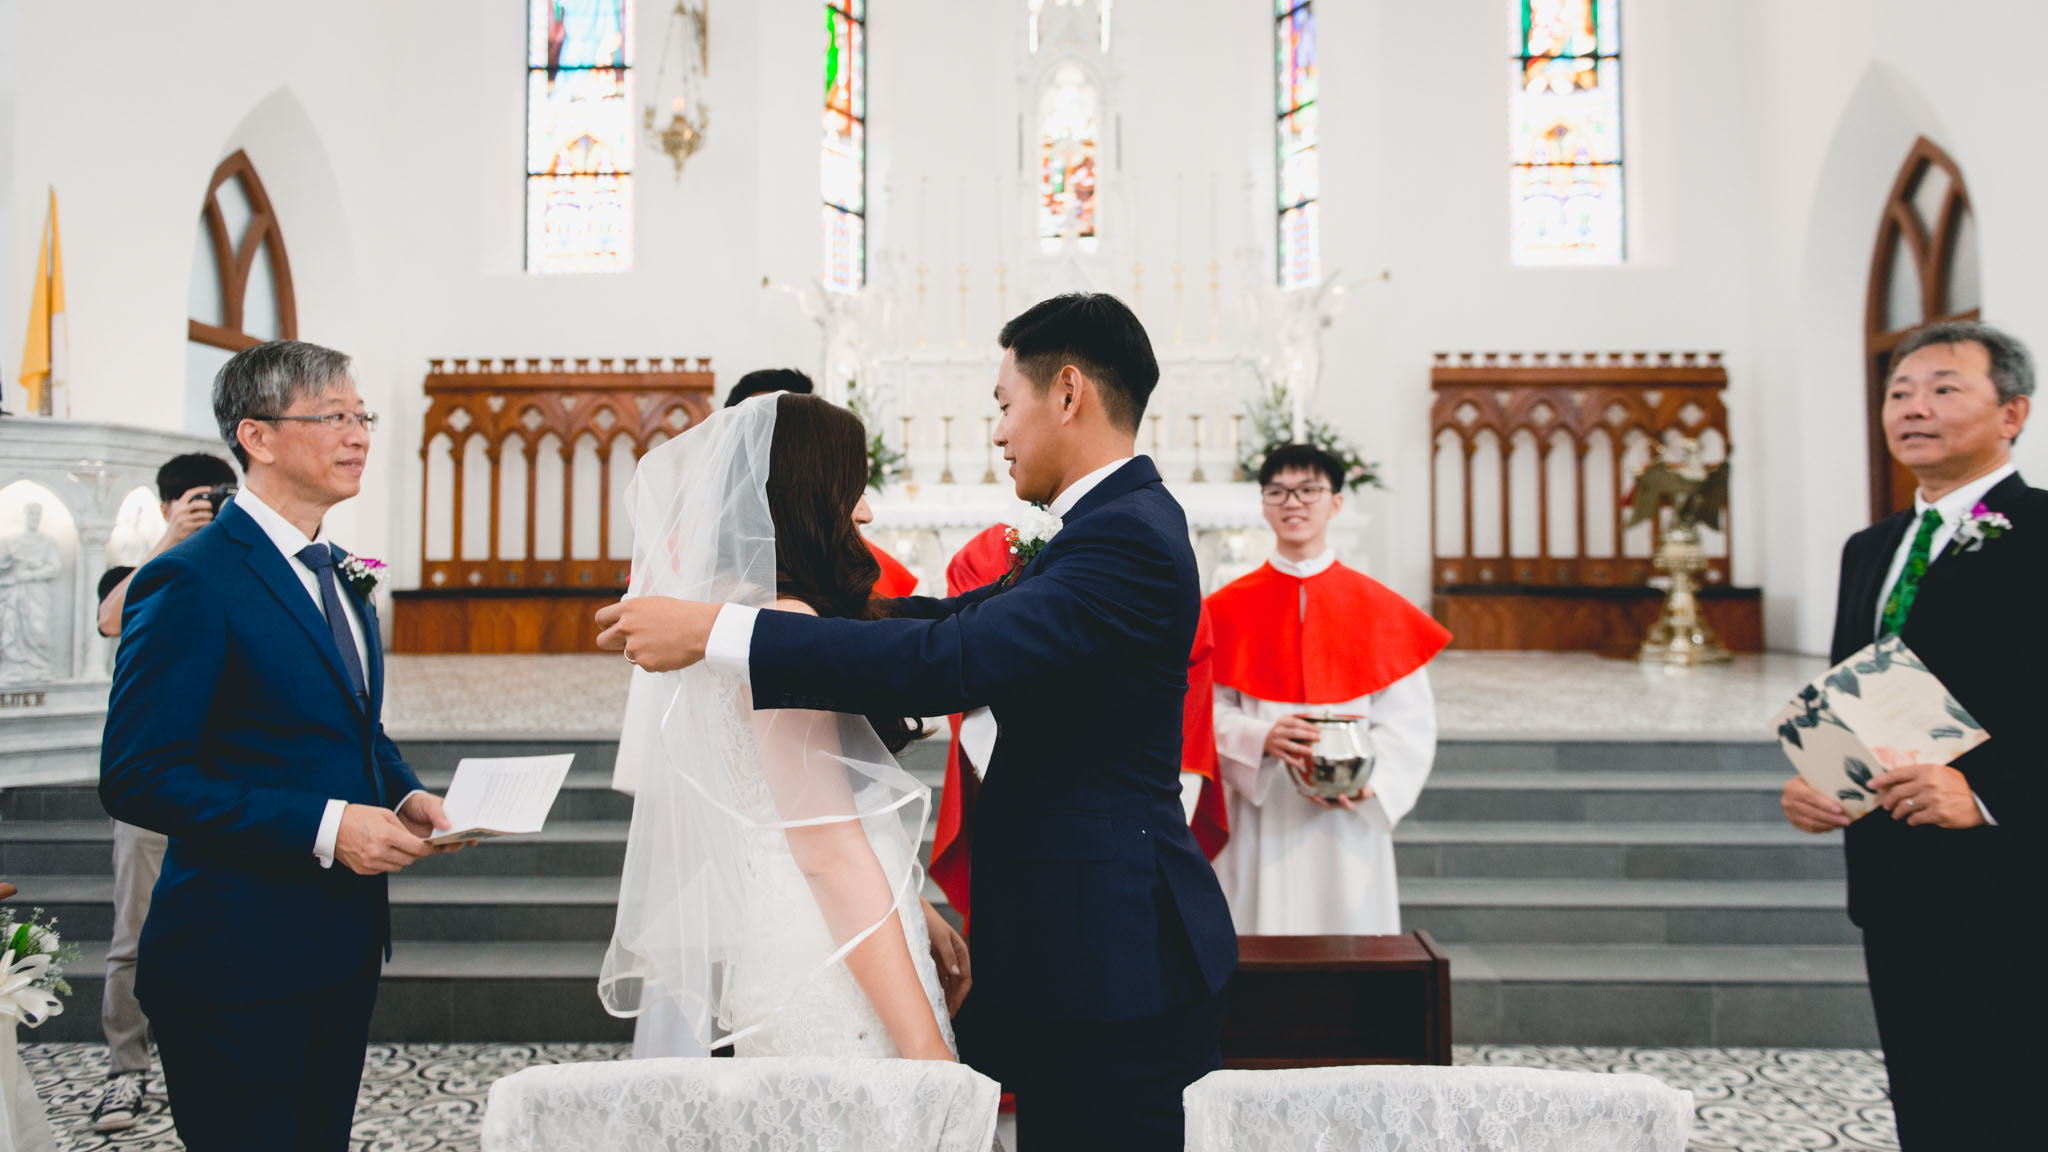 wedding church saints peter and paul 00036.JPG